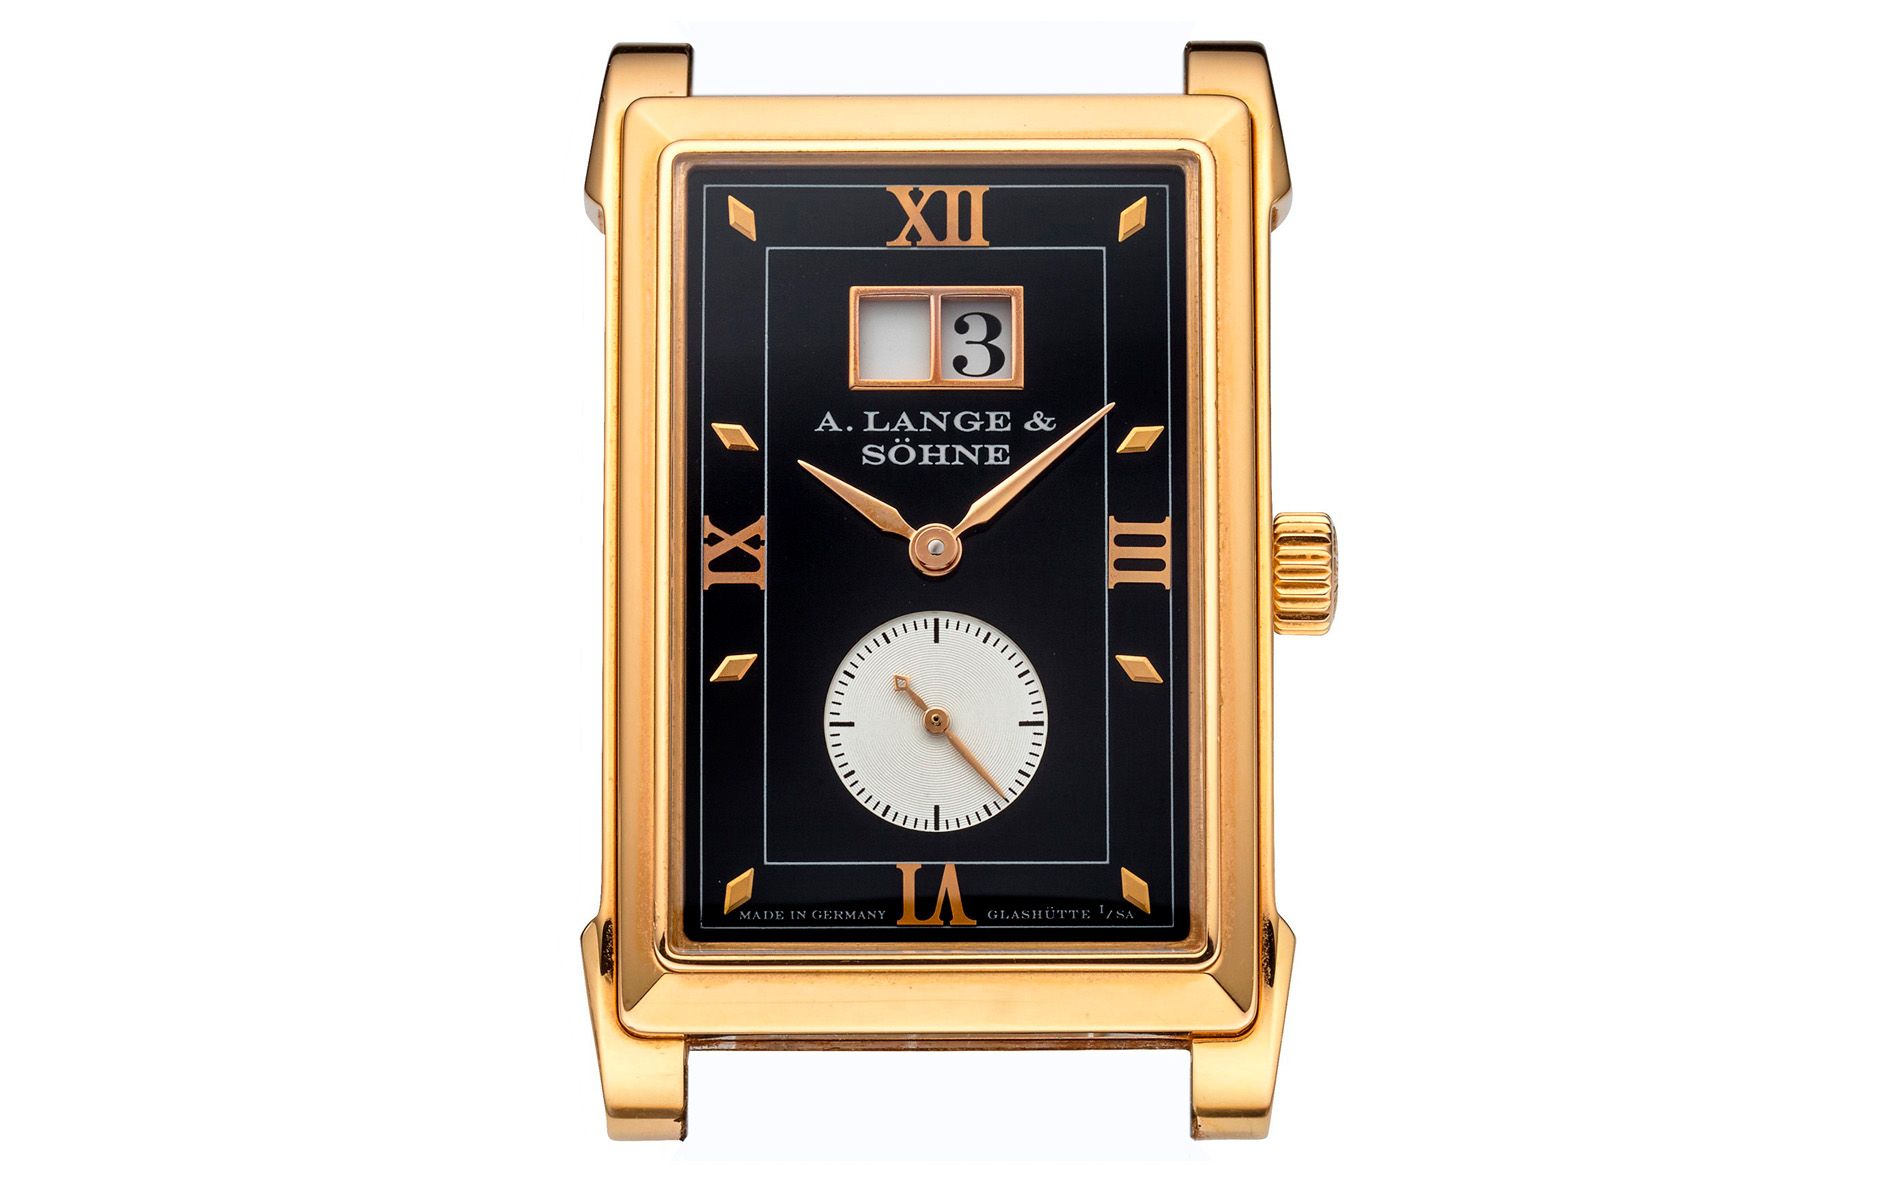 a lange söhne cabaret pink gold two tone dial 107.032 rectangular case